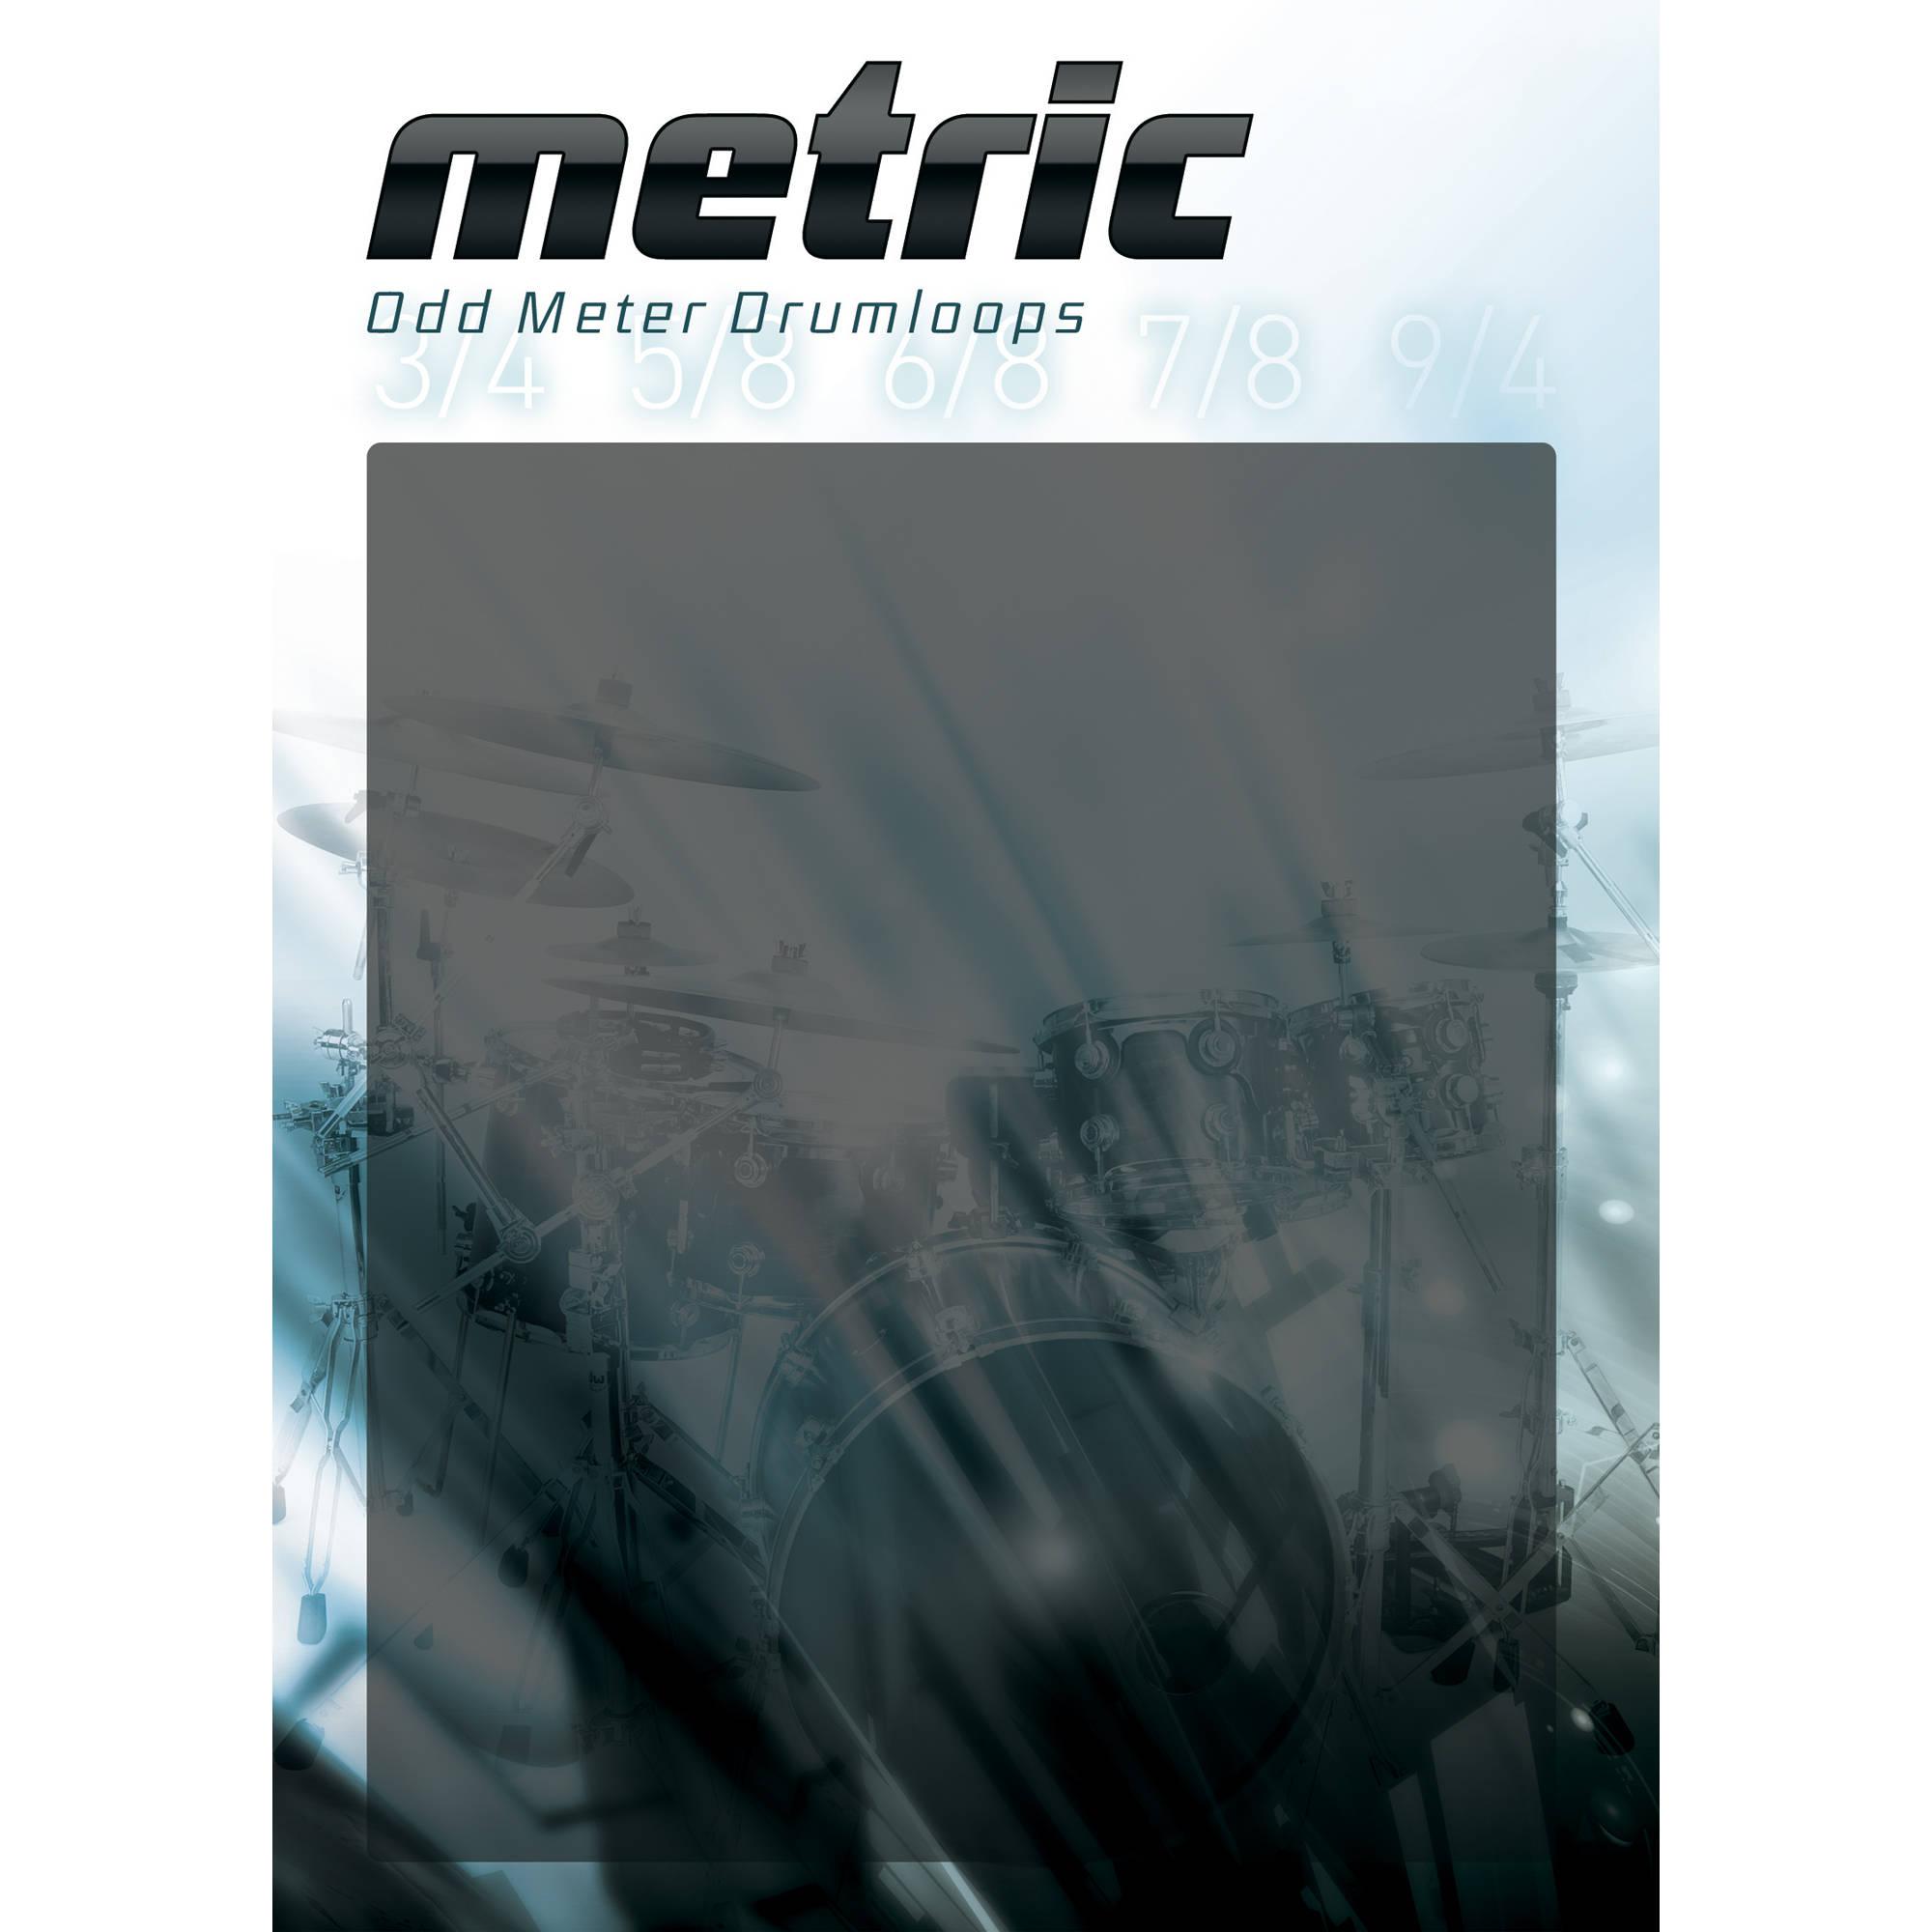 Big fish audio metric odd meter drumloops dvd momd1 orwxz b h for Big fish audio